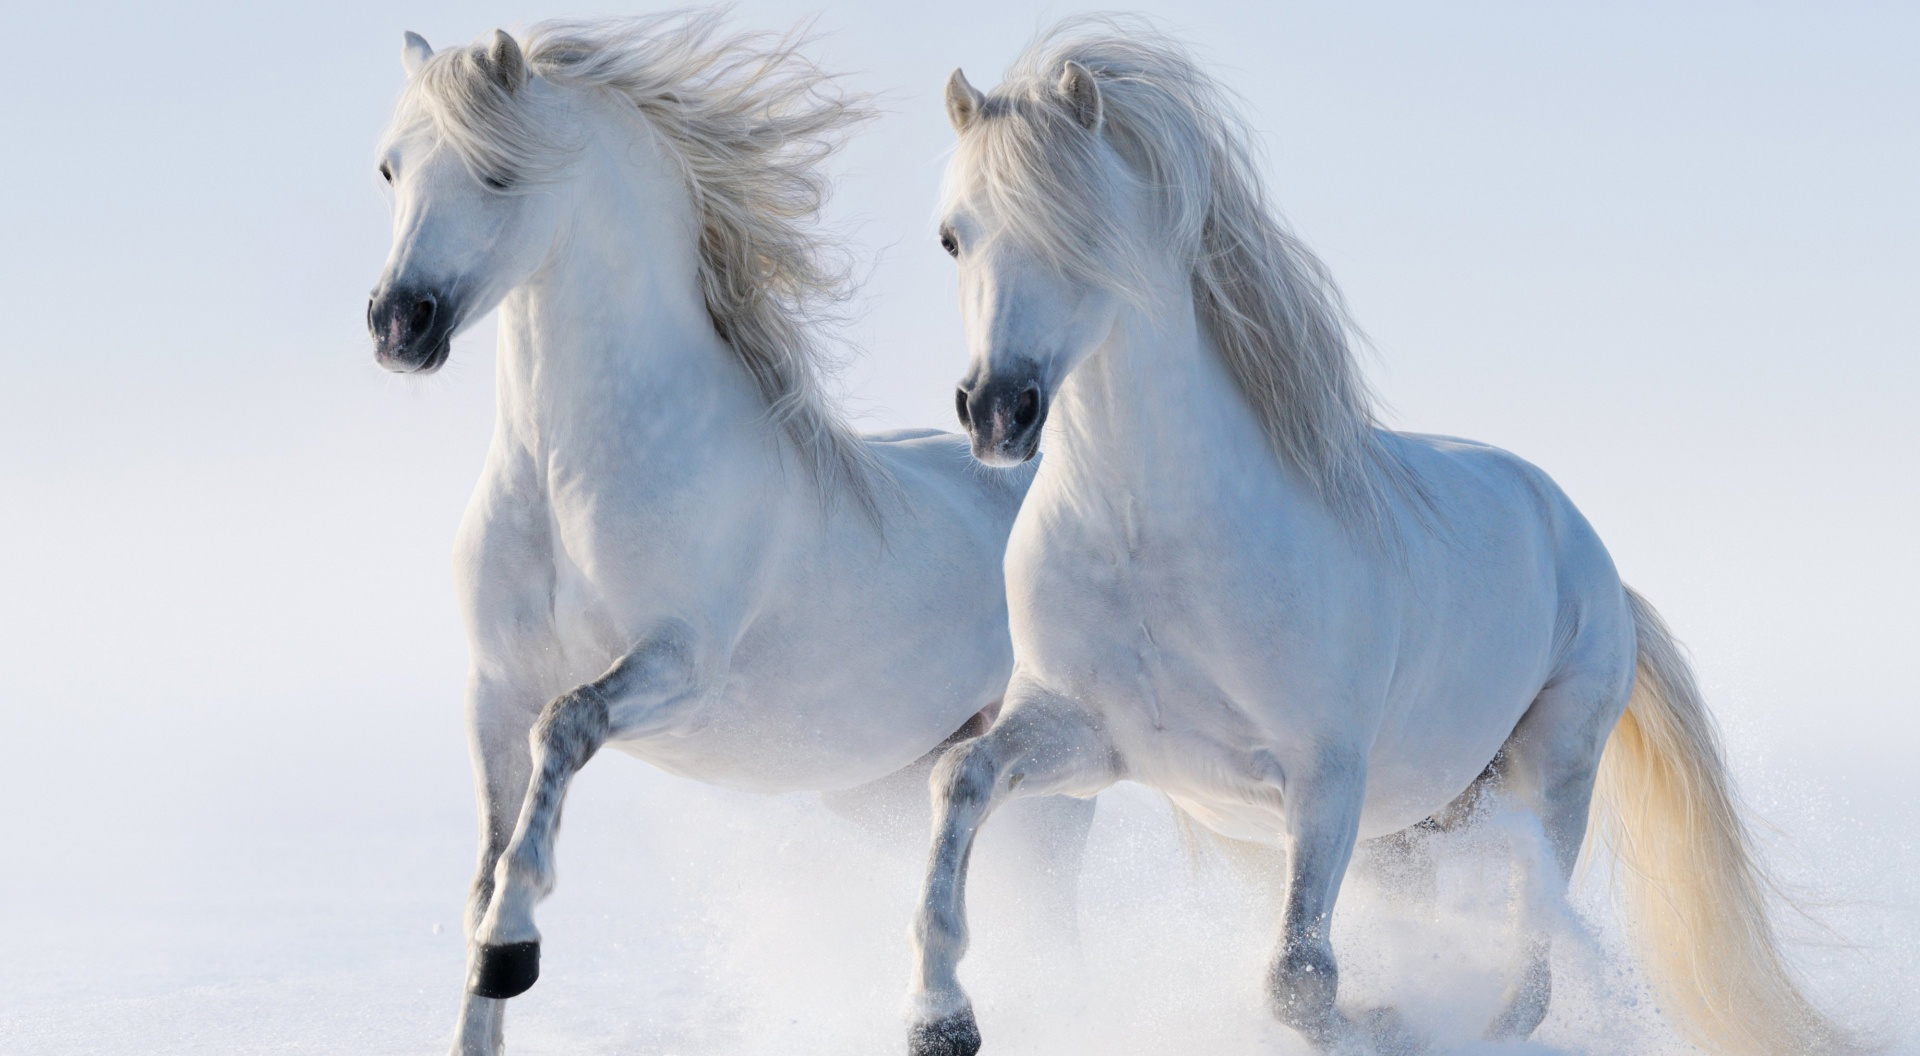 Assassins Creed 2 Hd Wallpapers Caballos Fondos De Pantalla Horses Wallpapers Hd